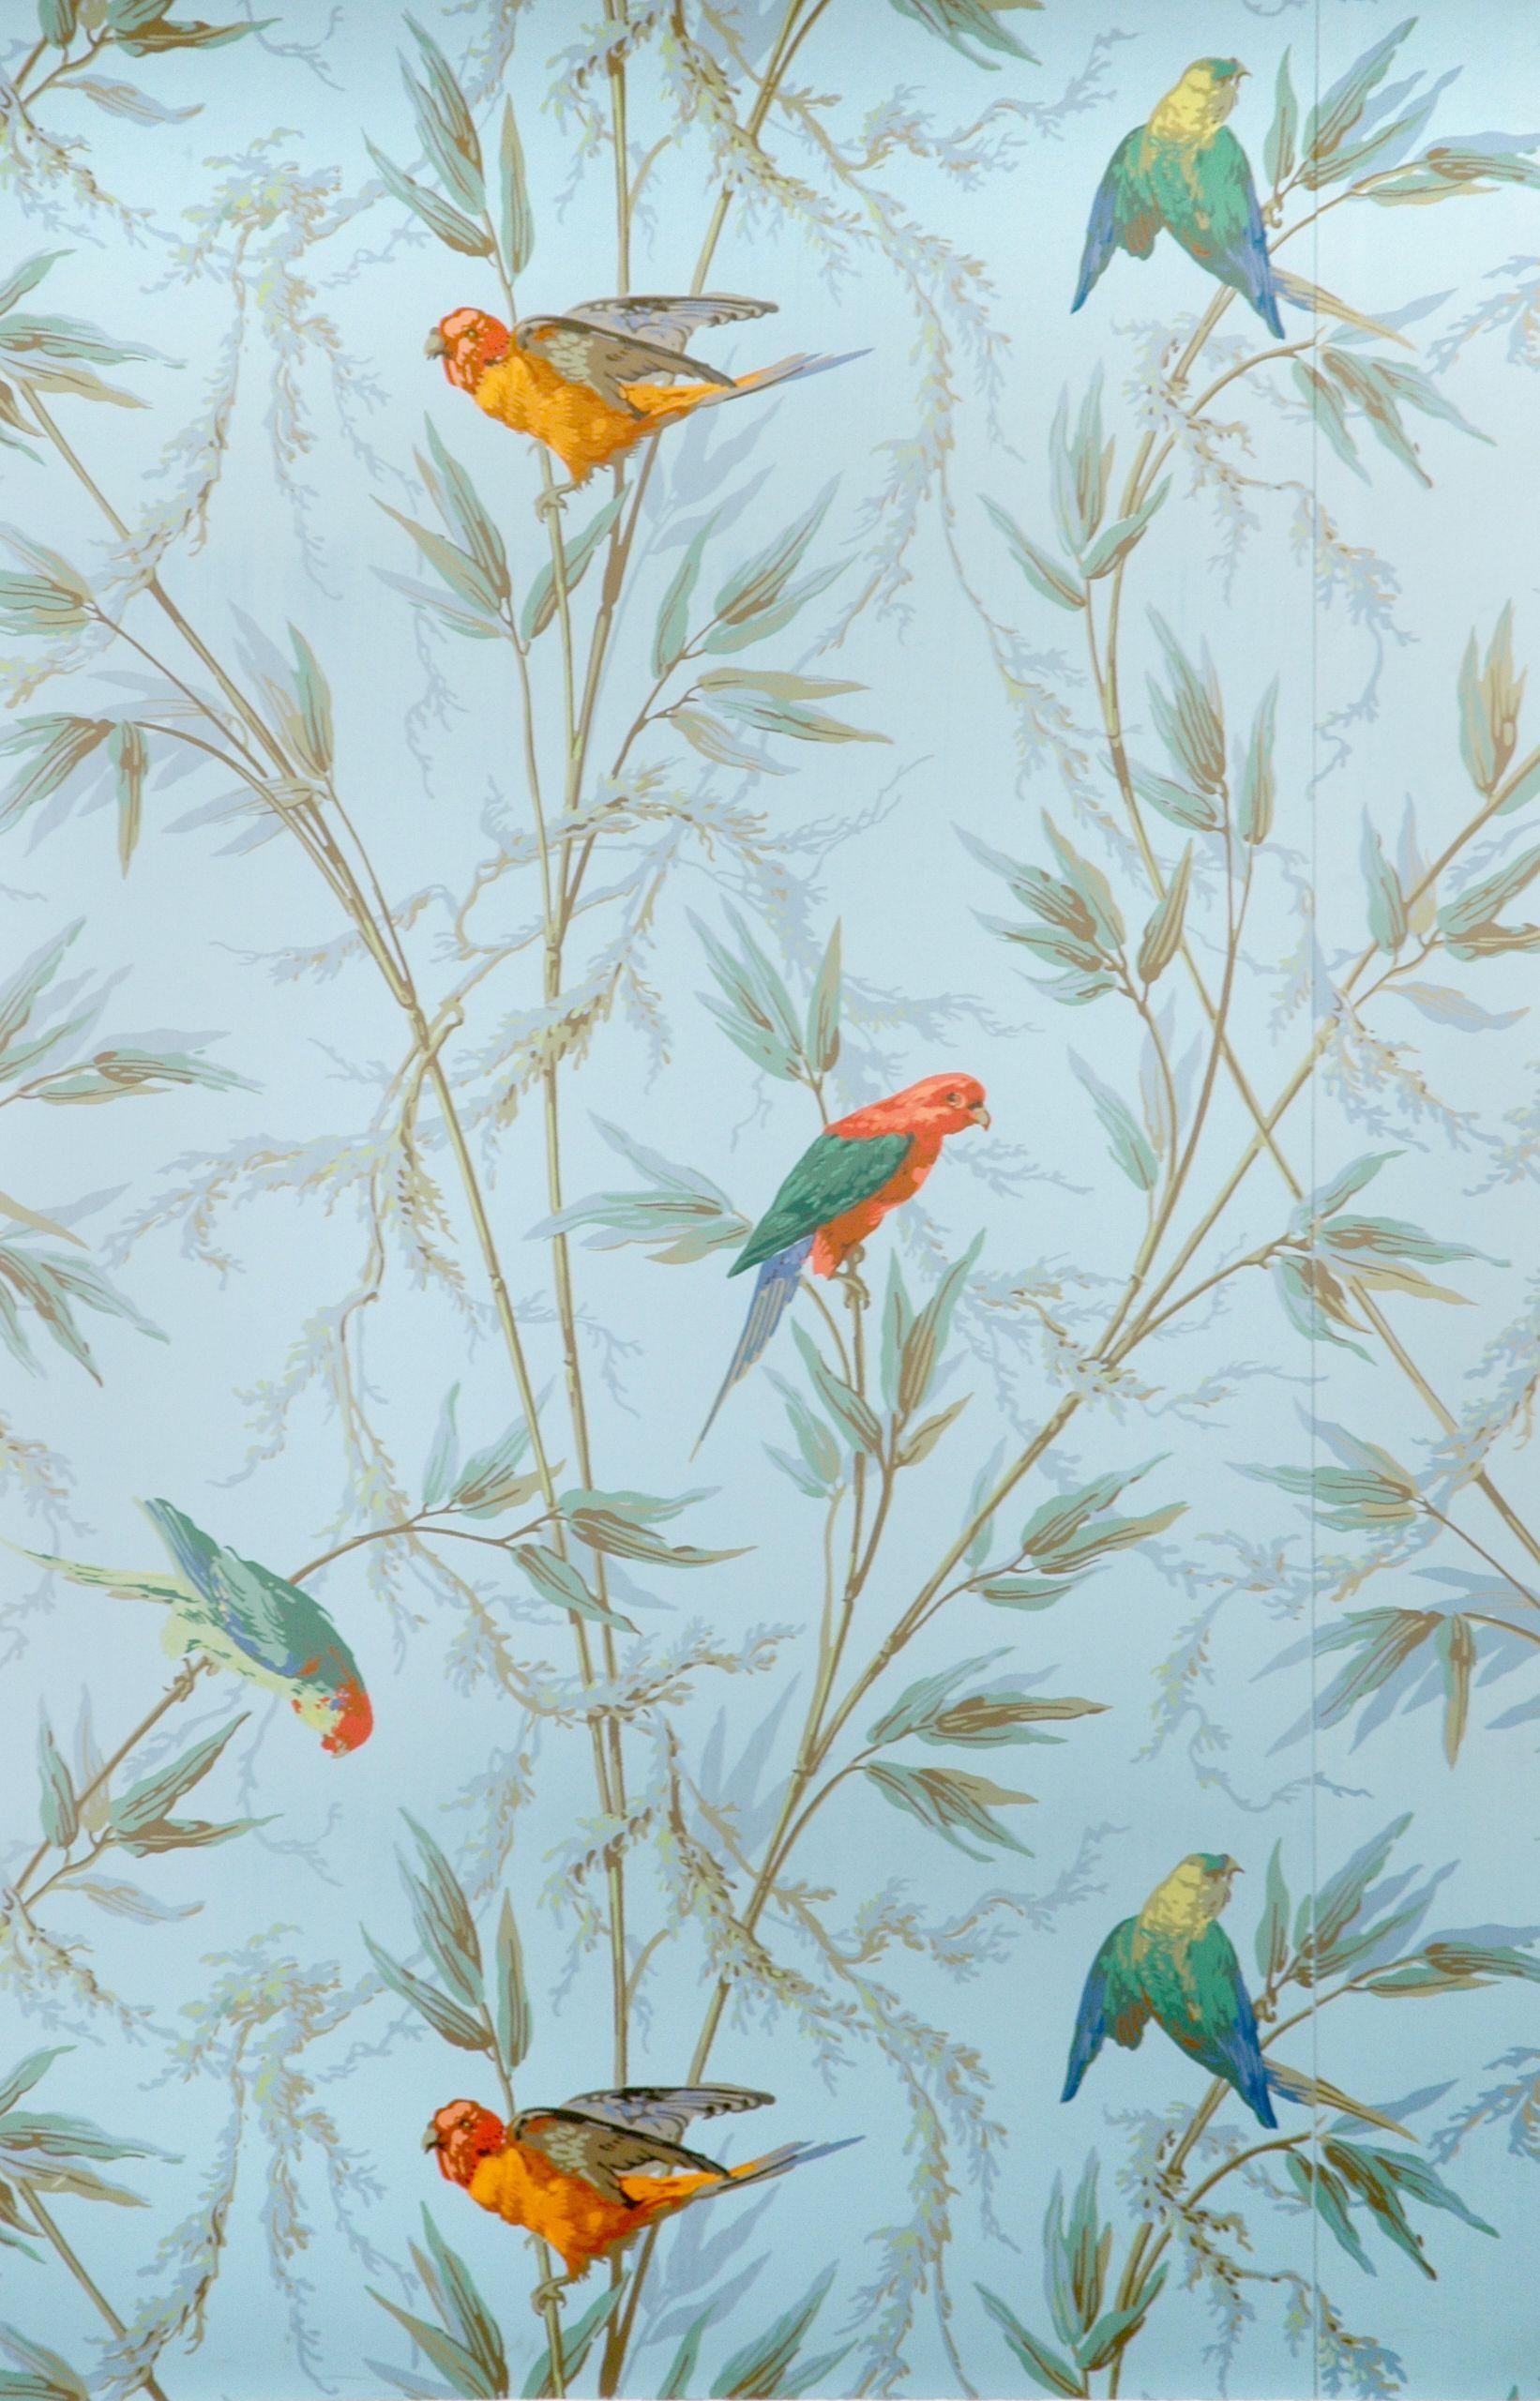 Tapeten historische tapeten hembus gmbh ca 1810 for Farben und tapeten